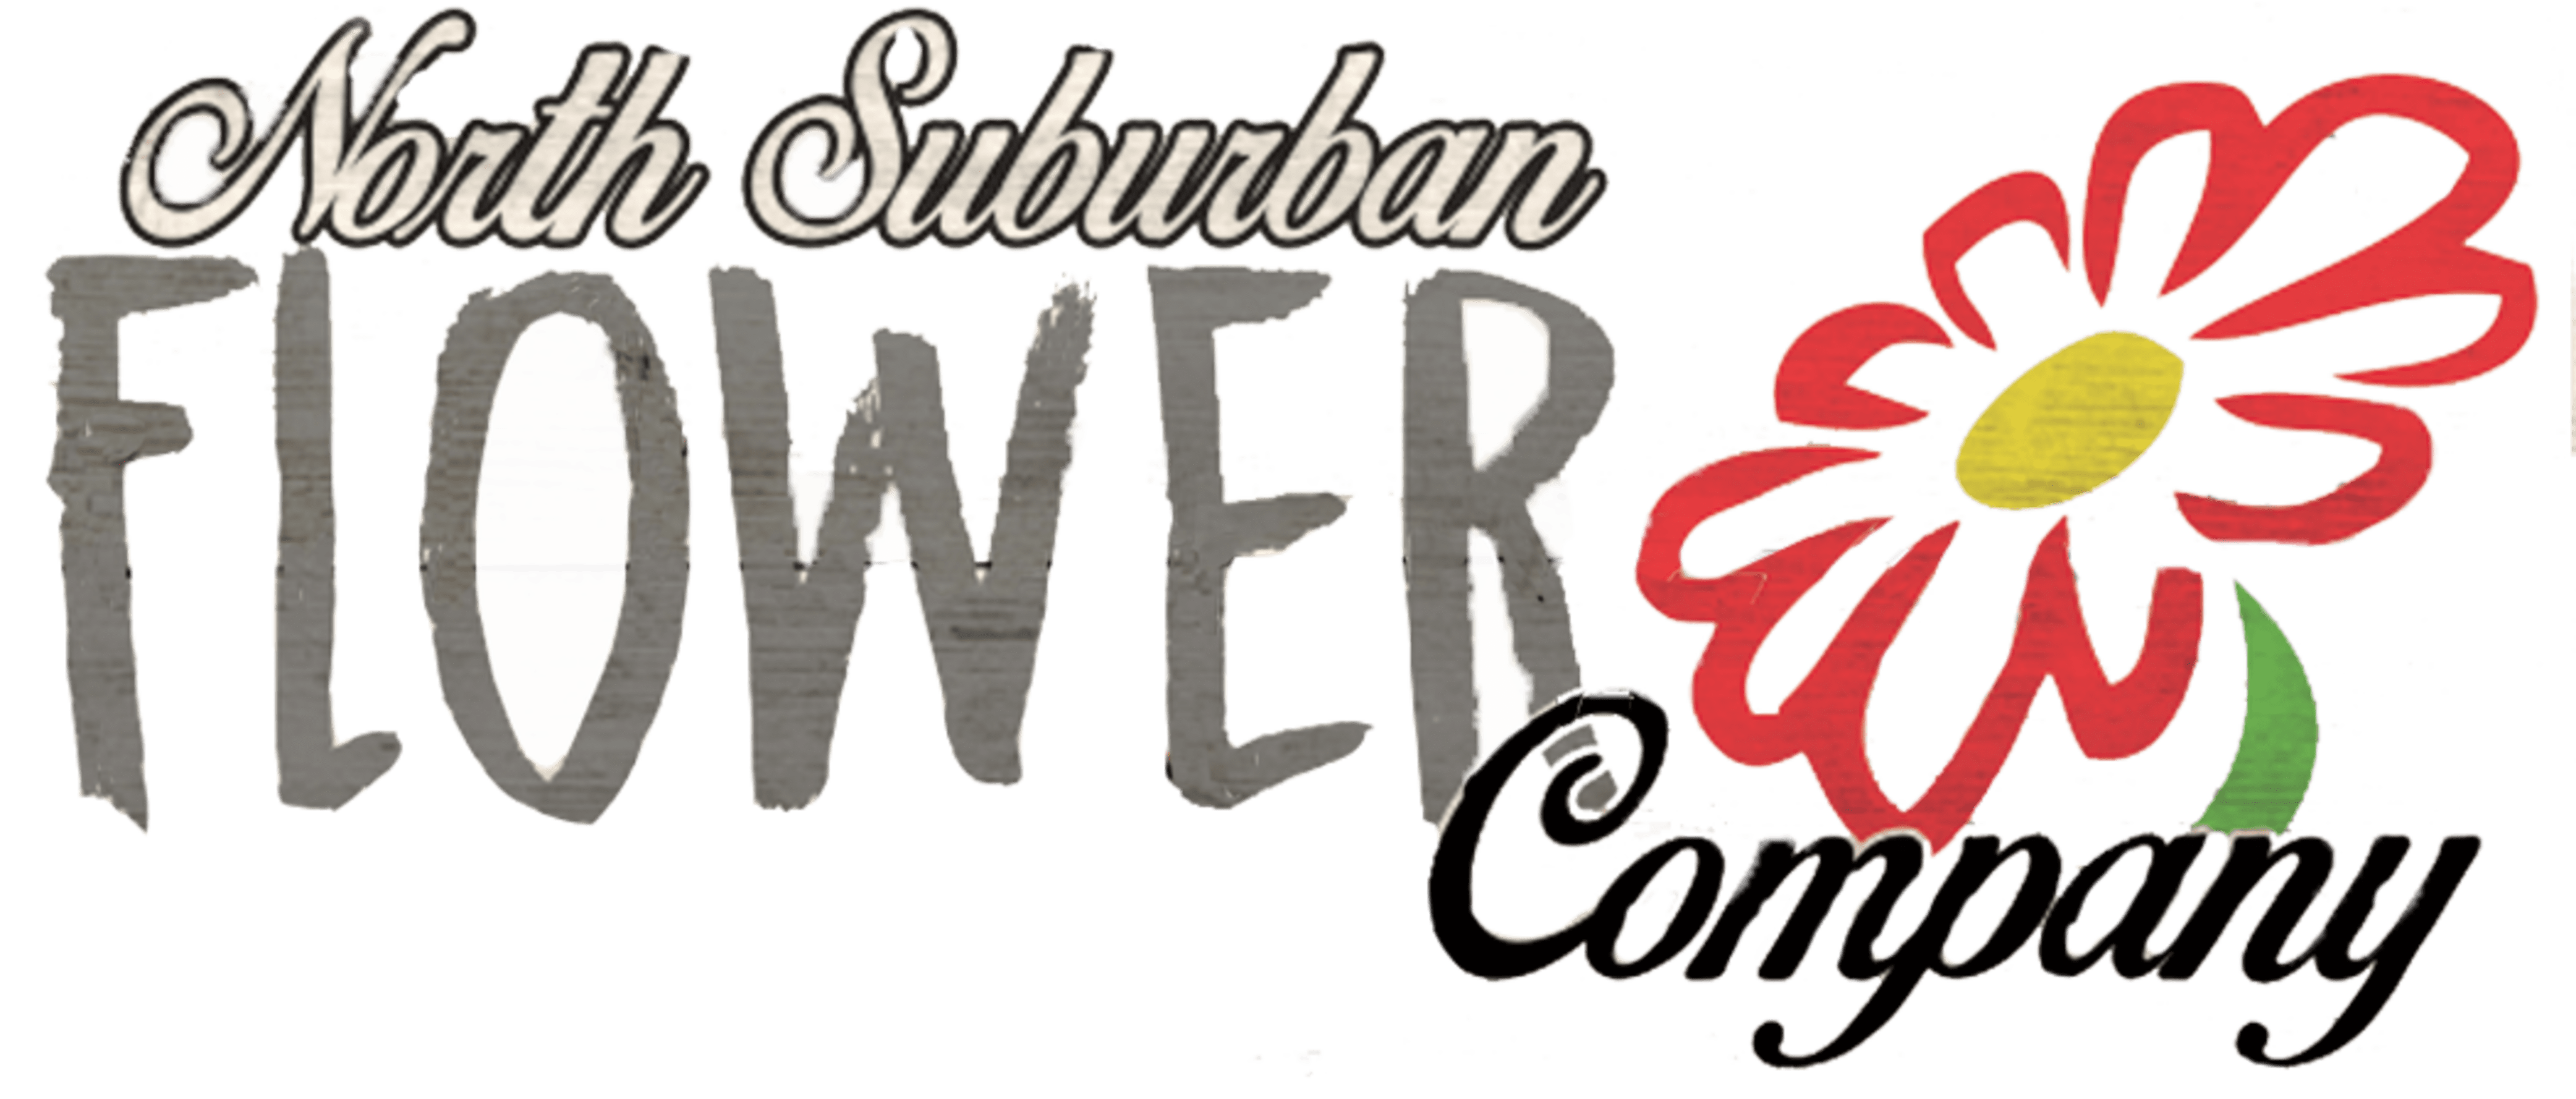 northsuburbanflowercompany-logo_3